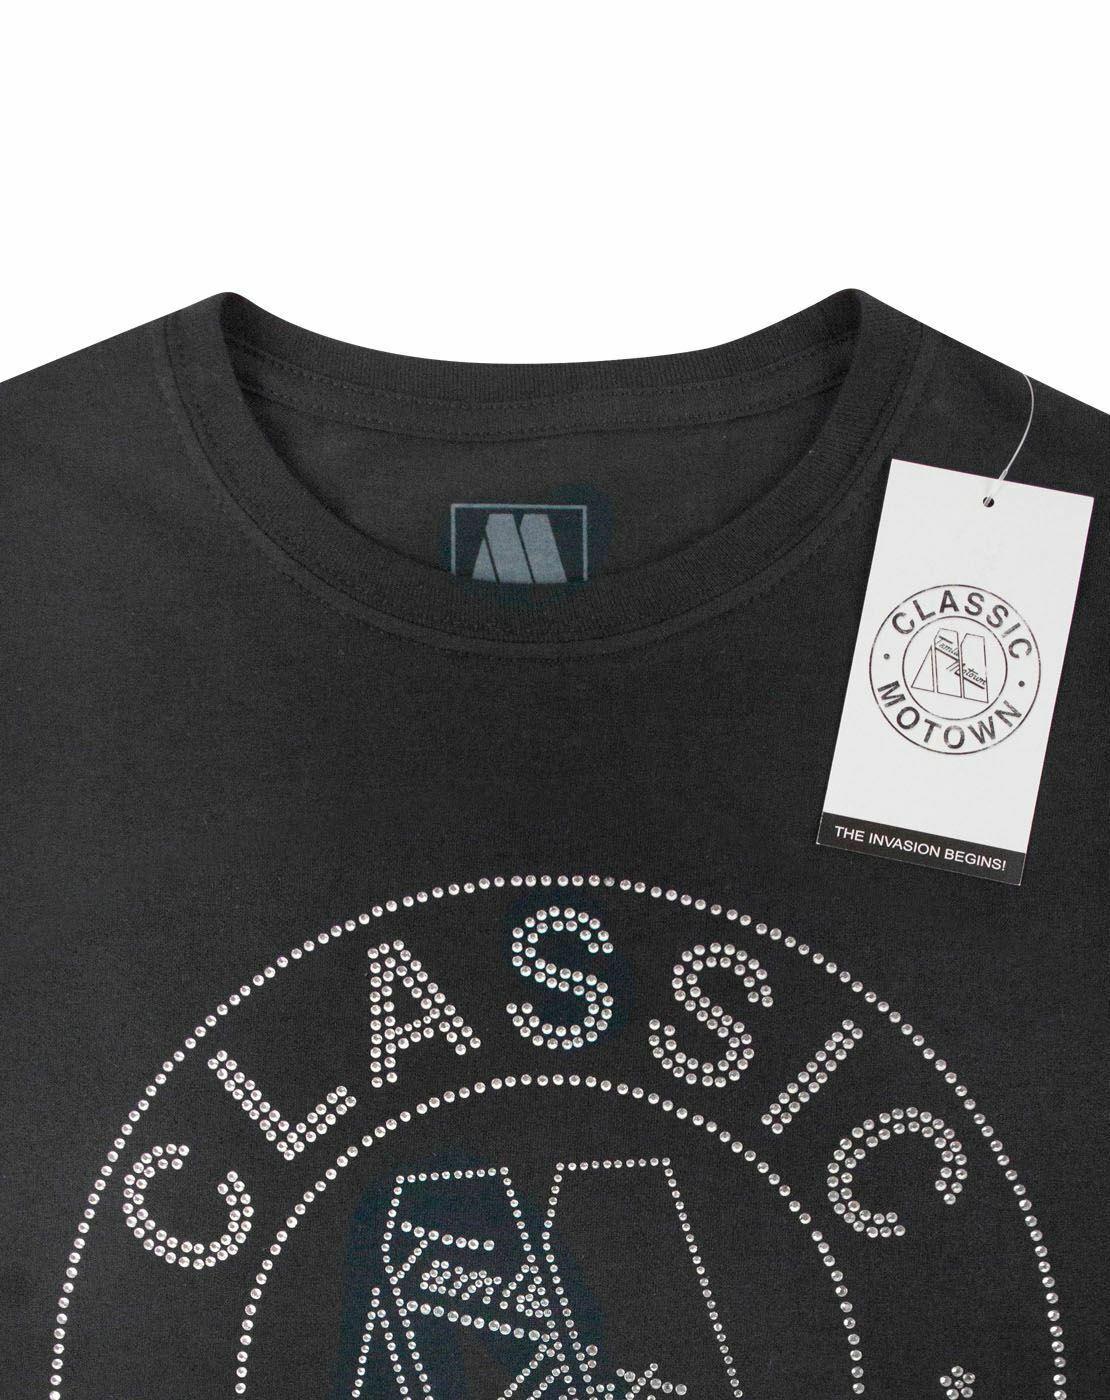 Motown Ladies Fashion T-Shirts Classic With Rhinestone Application